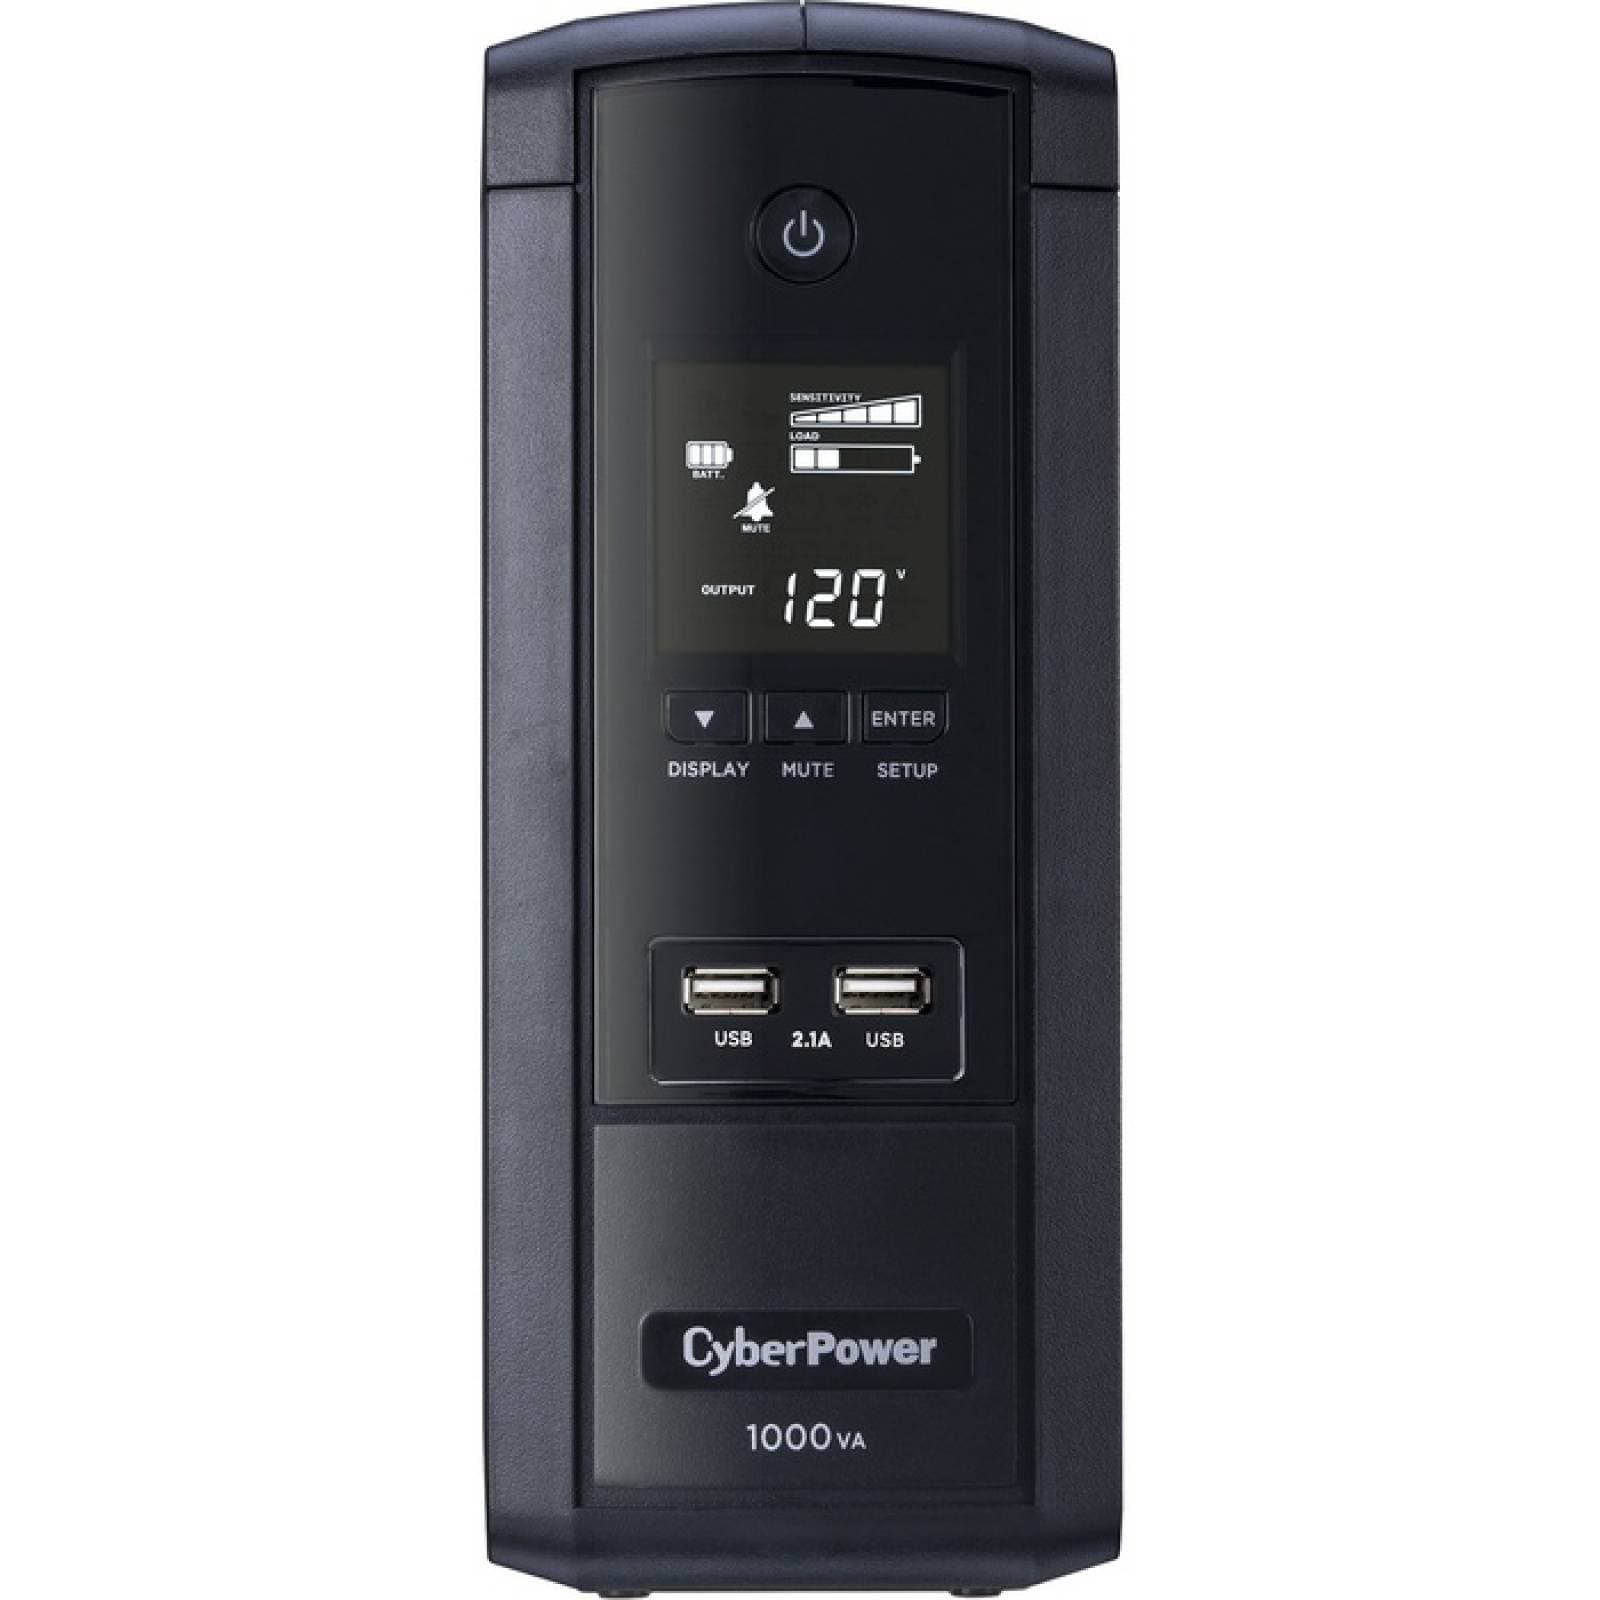 CyberPower 1000VA BRG1000AVRLCD UPS con 600W AVR LCD y 21 USB de carga